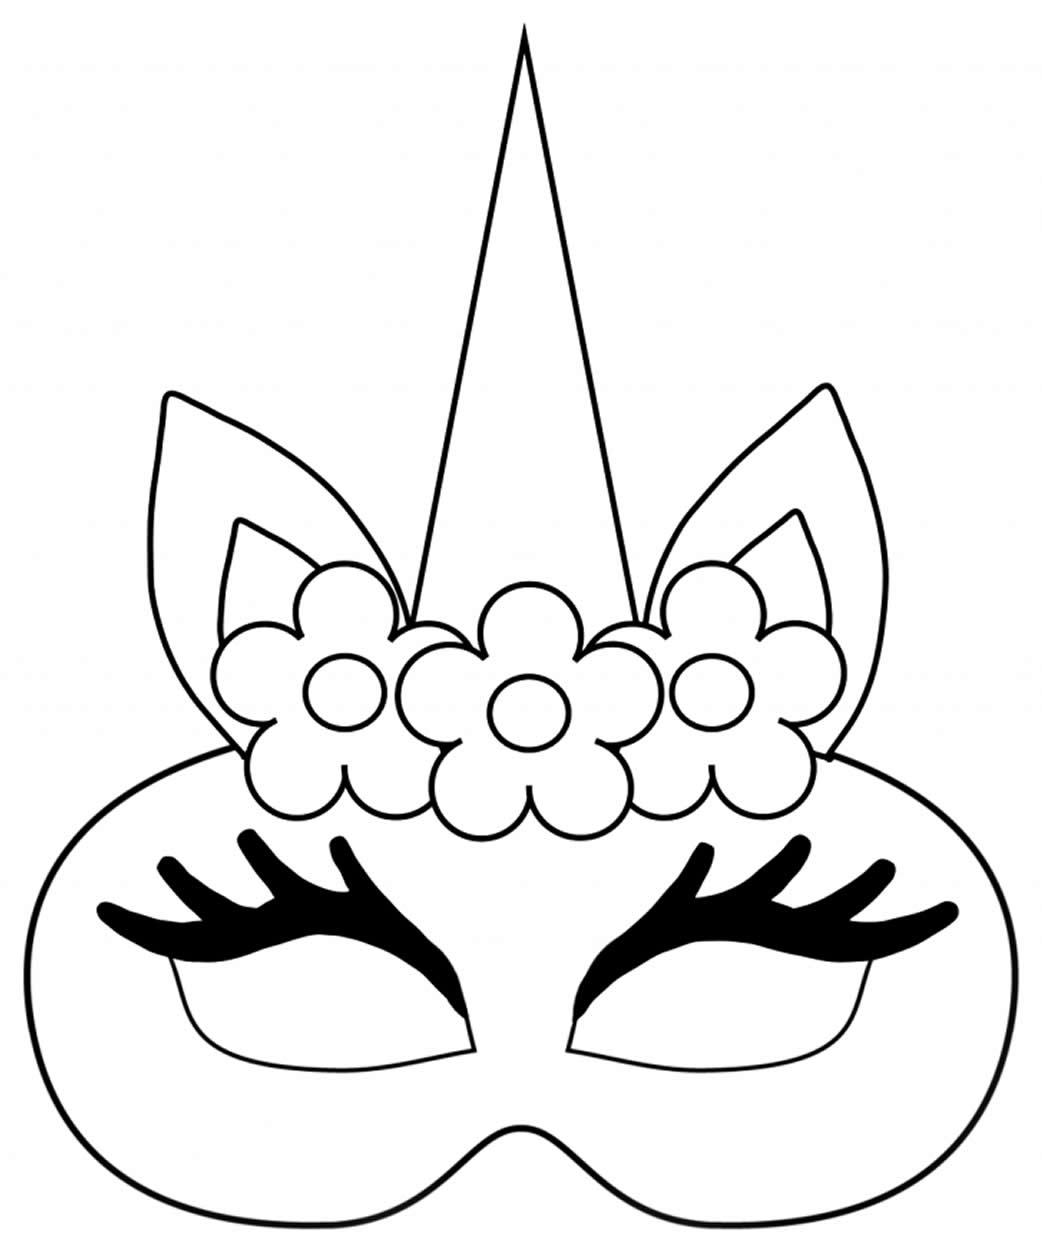 Moldes de máscaras infantis de unicórnio